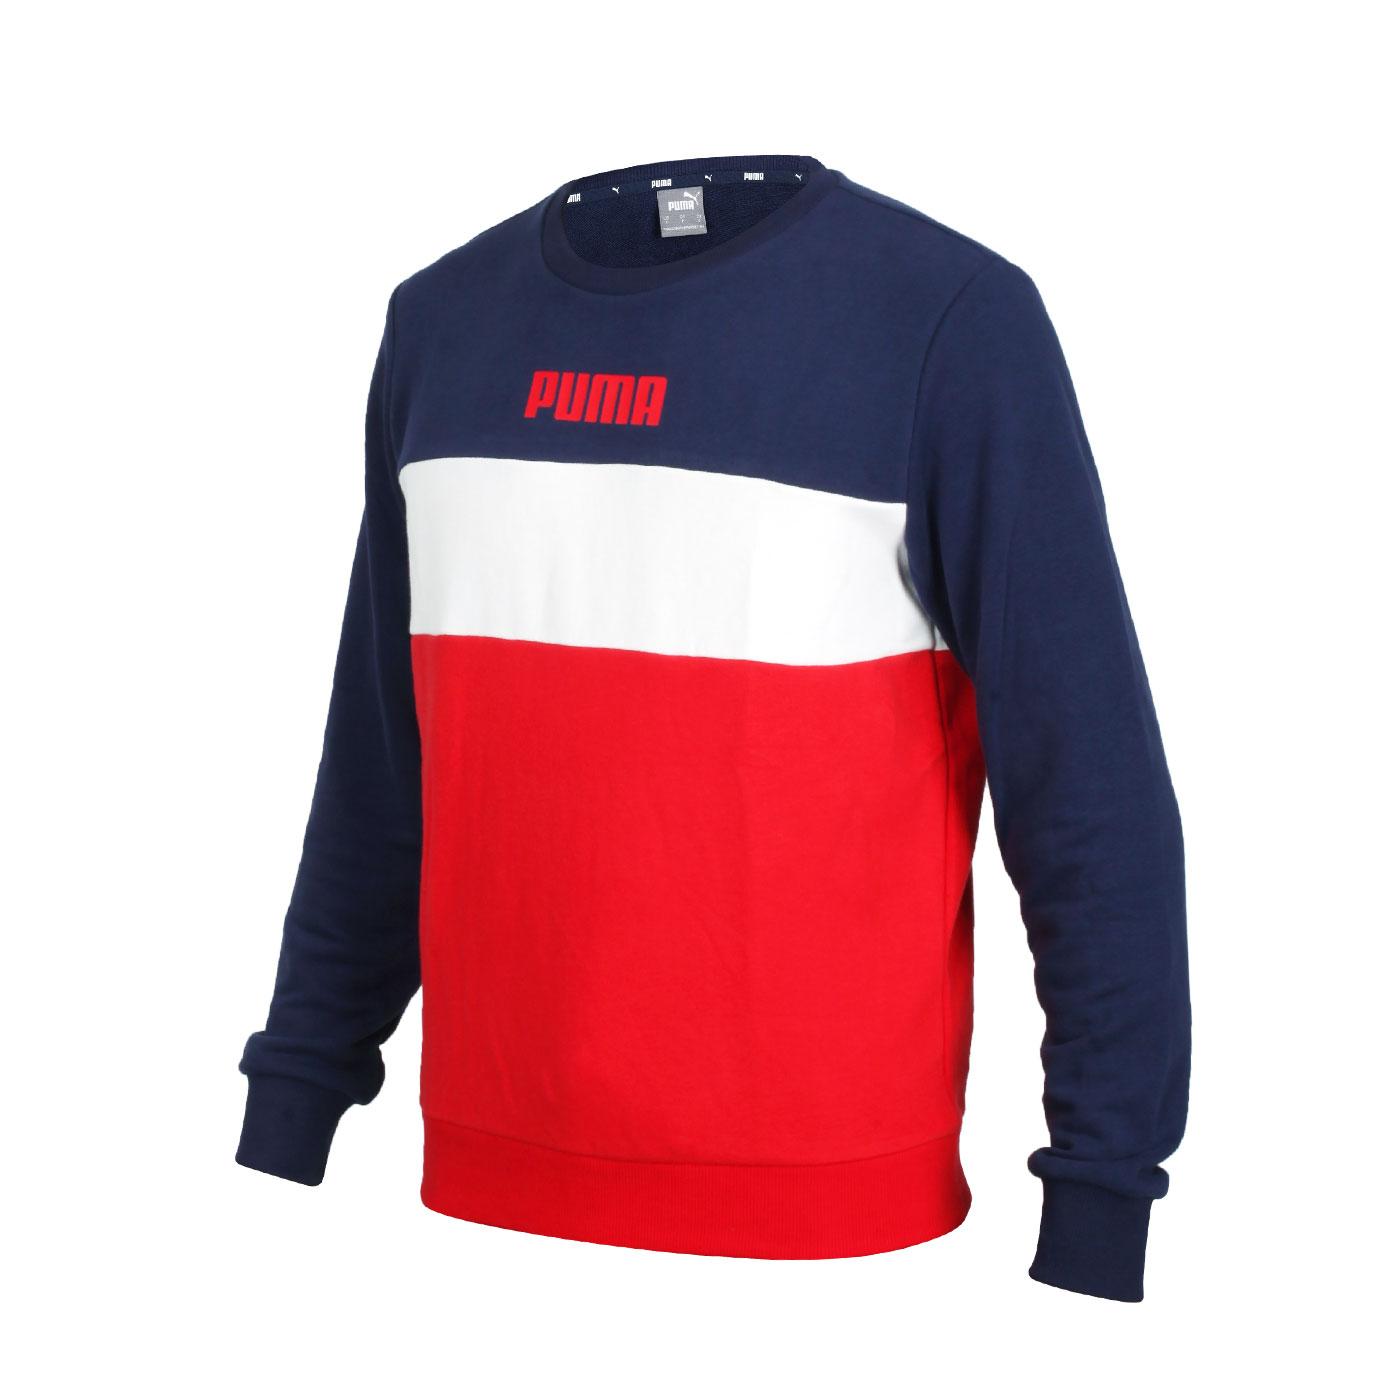 PUMA 男款基本系列長袖圓領T恤 58715606 - 丈青白紅